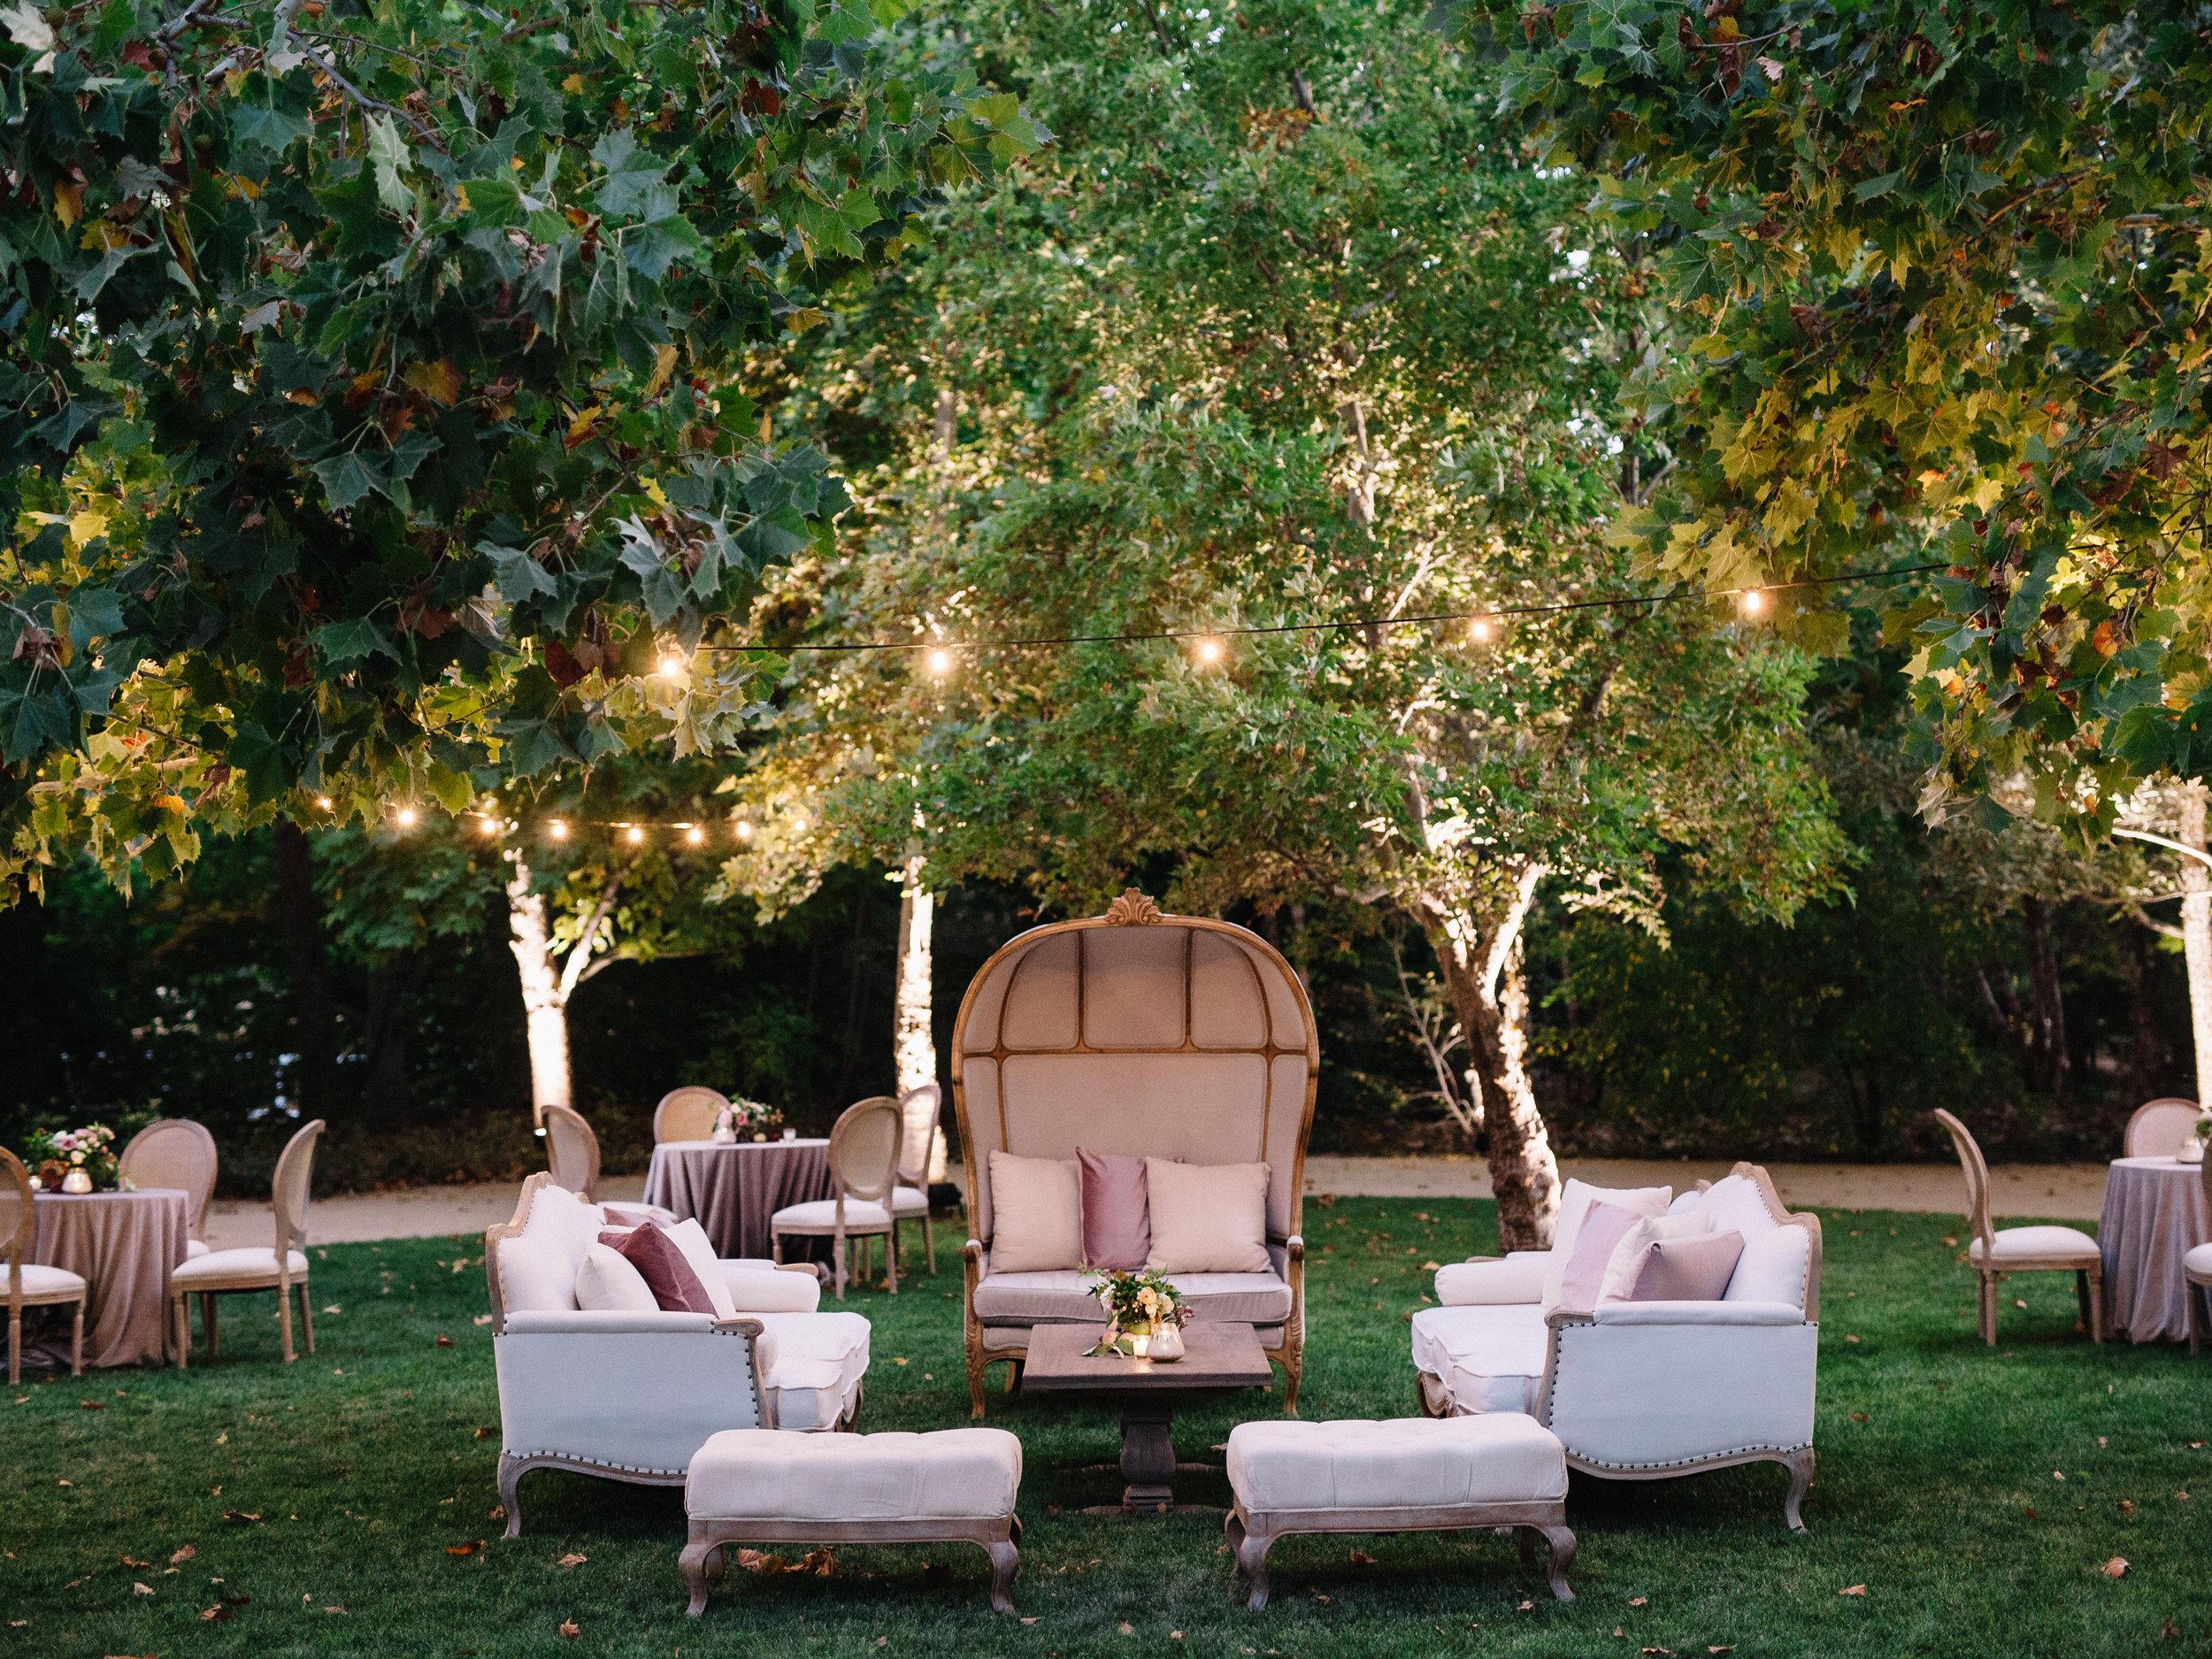 santa-barbara-elopement-elope-wedding-planner-planning-coordinator-day-of-intimate-event-design-kestrel-park-santa-ynez-english-country-estate-garden-castle (34).jpg